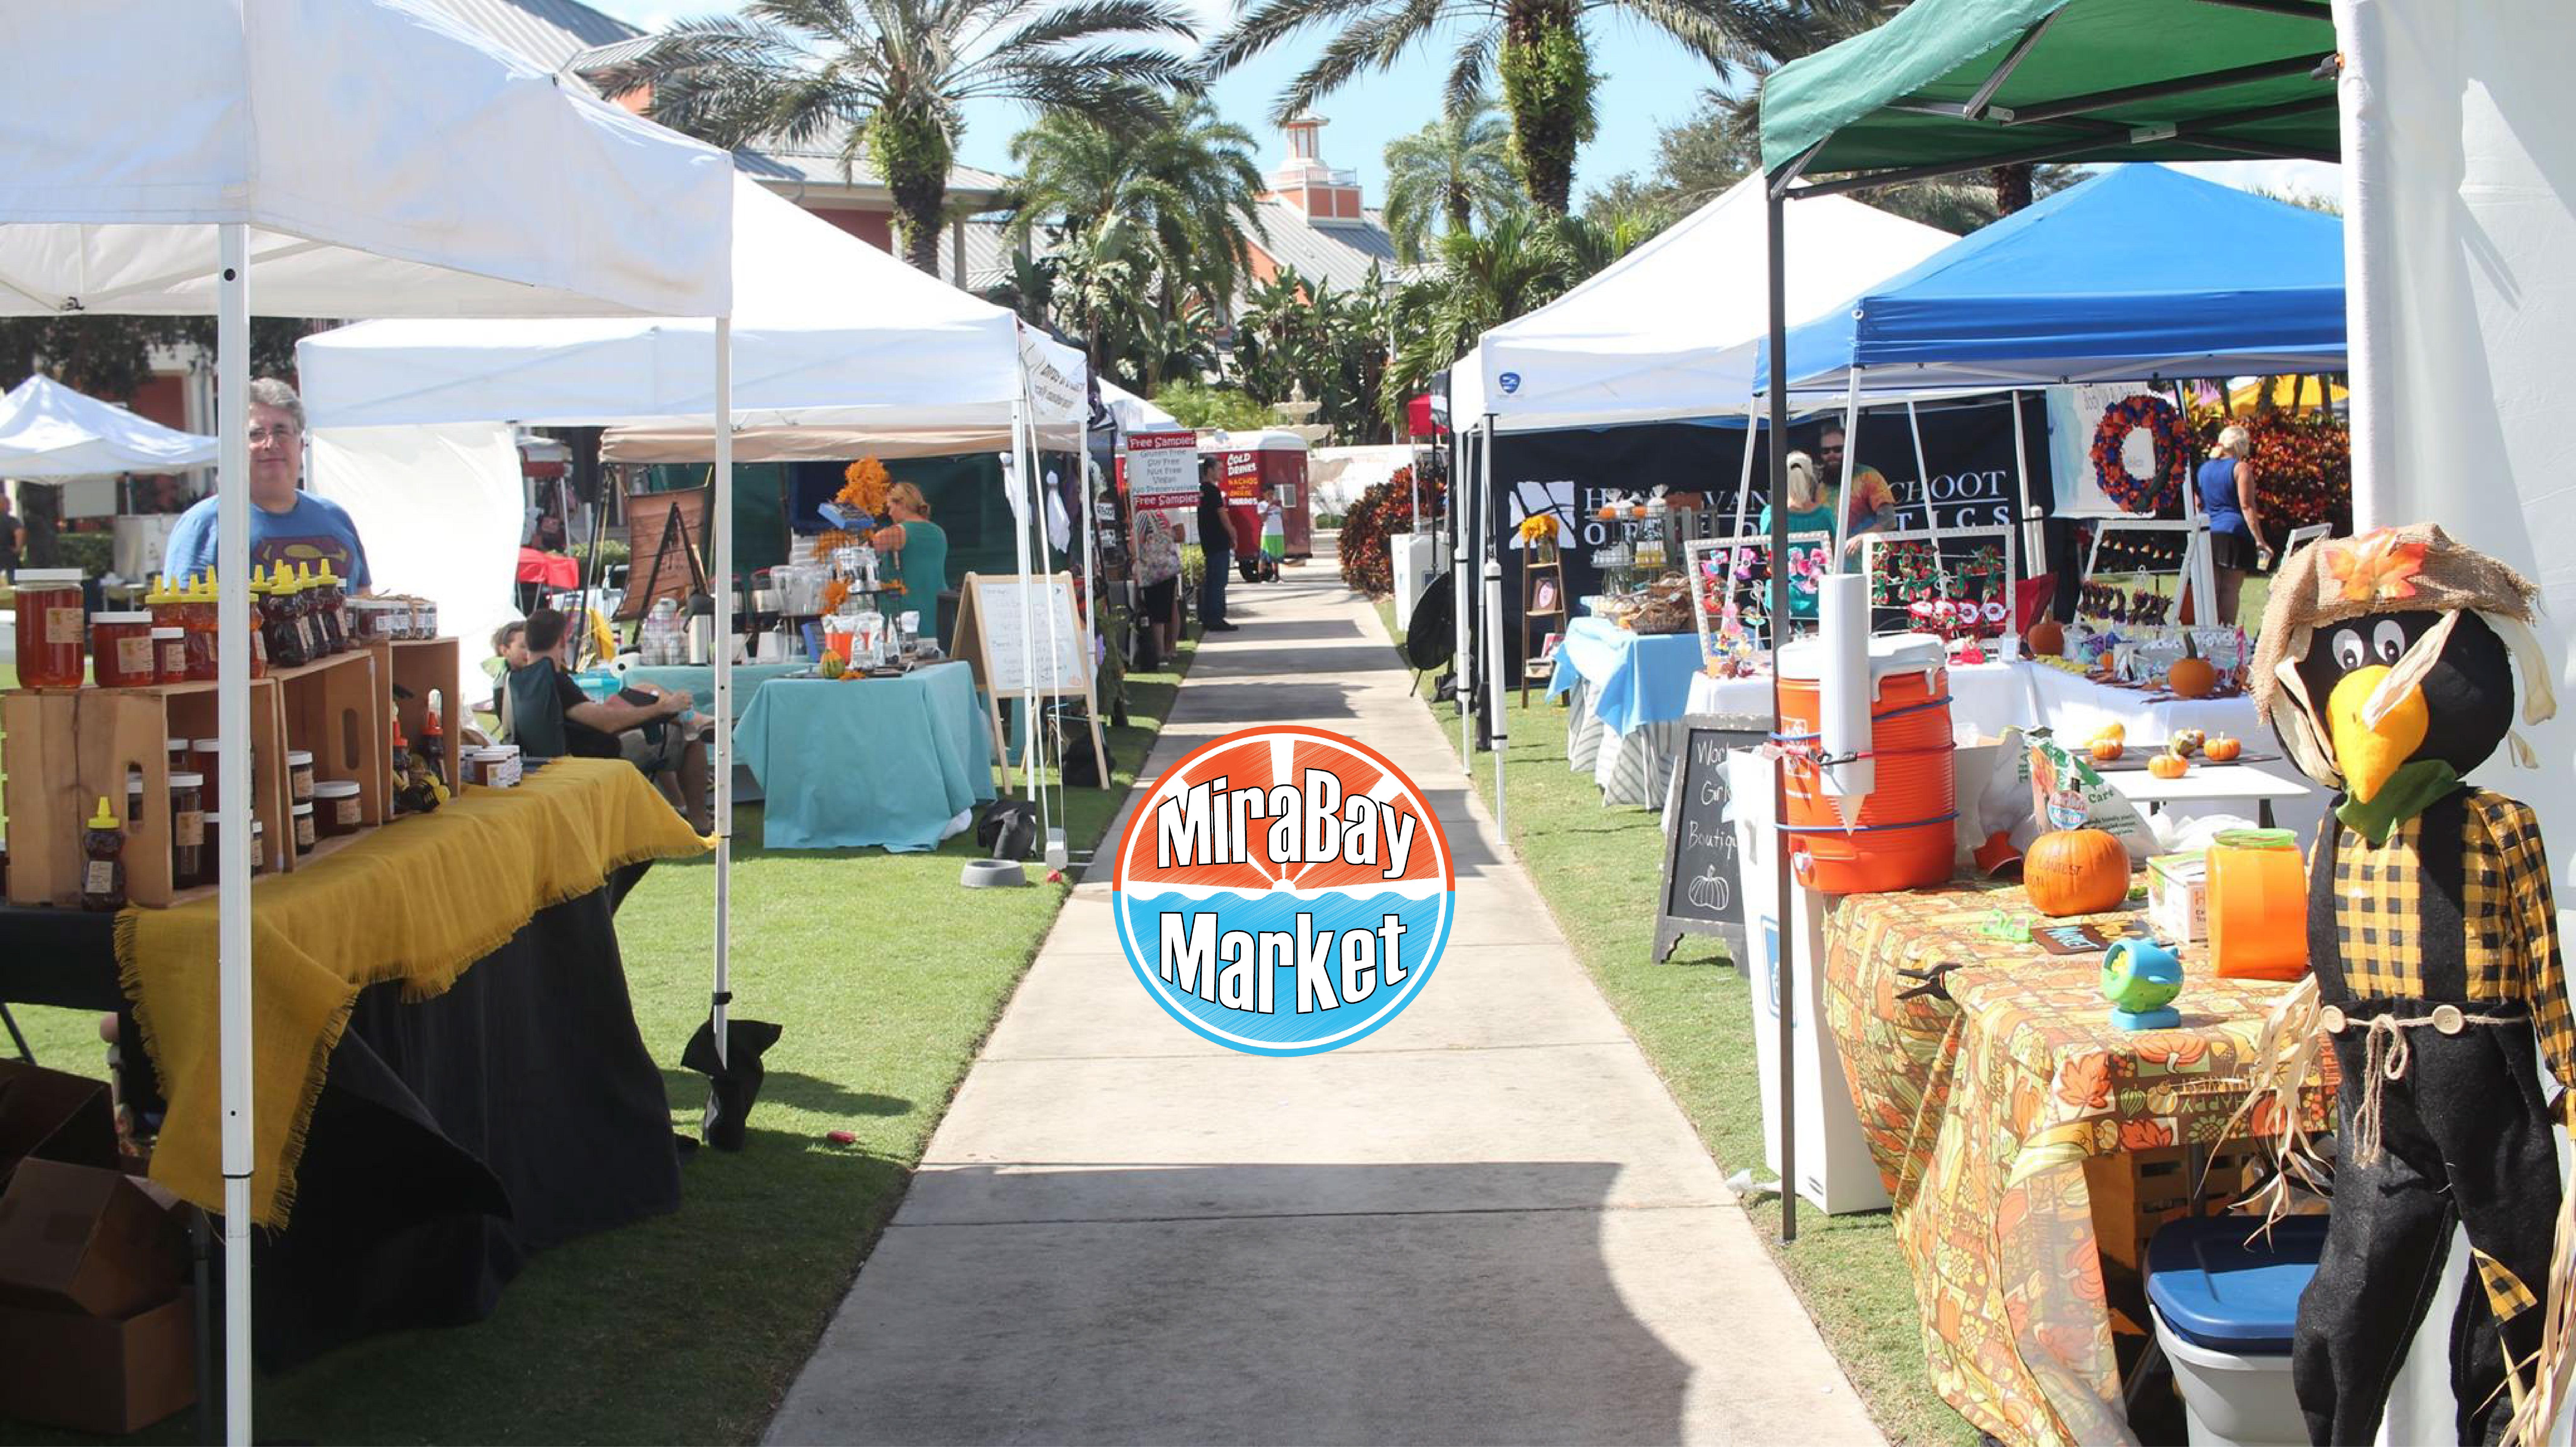 Mira Bay Apollo Beach.MiraBay Market A Farmers Market In